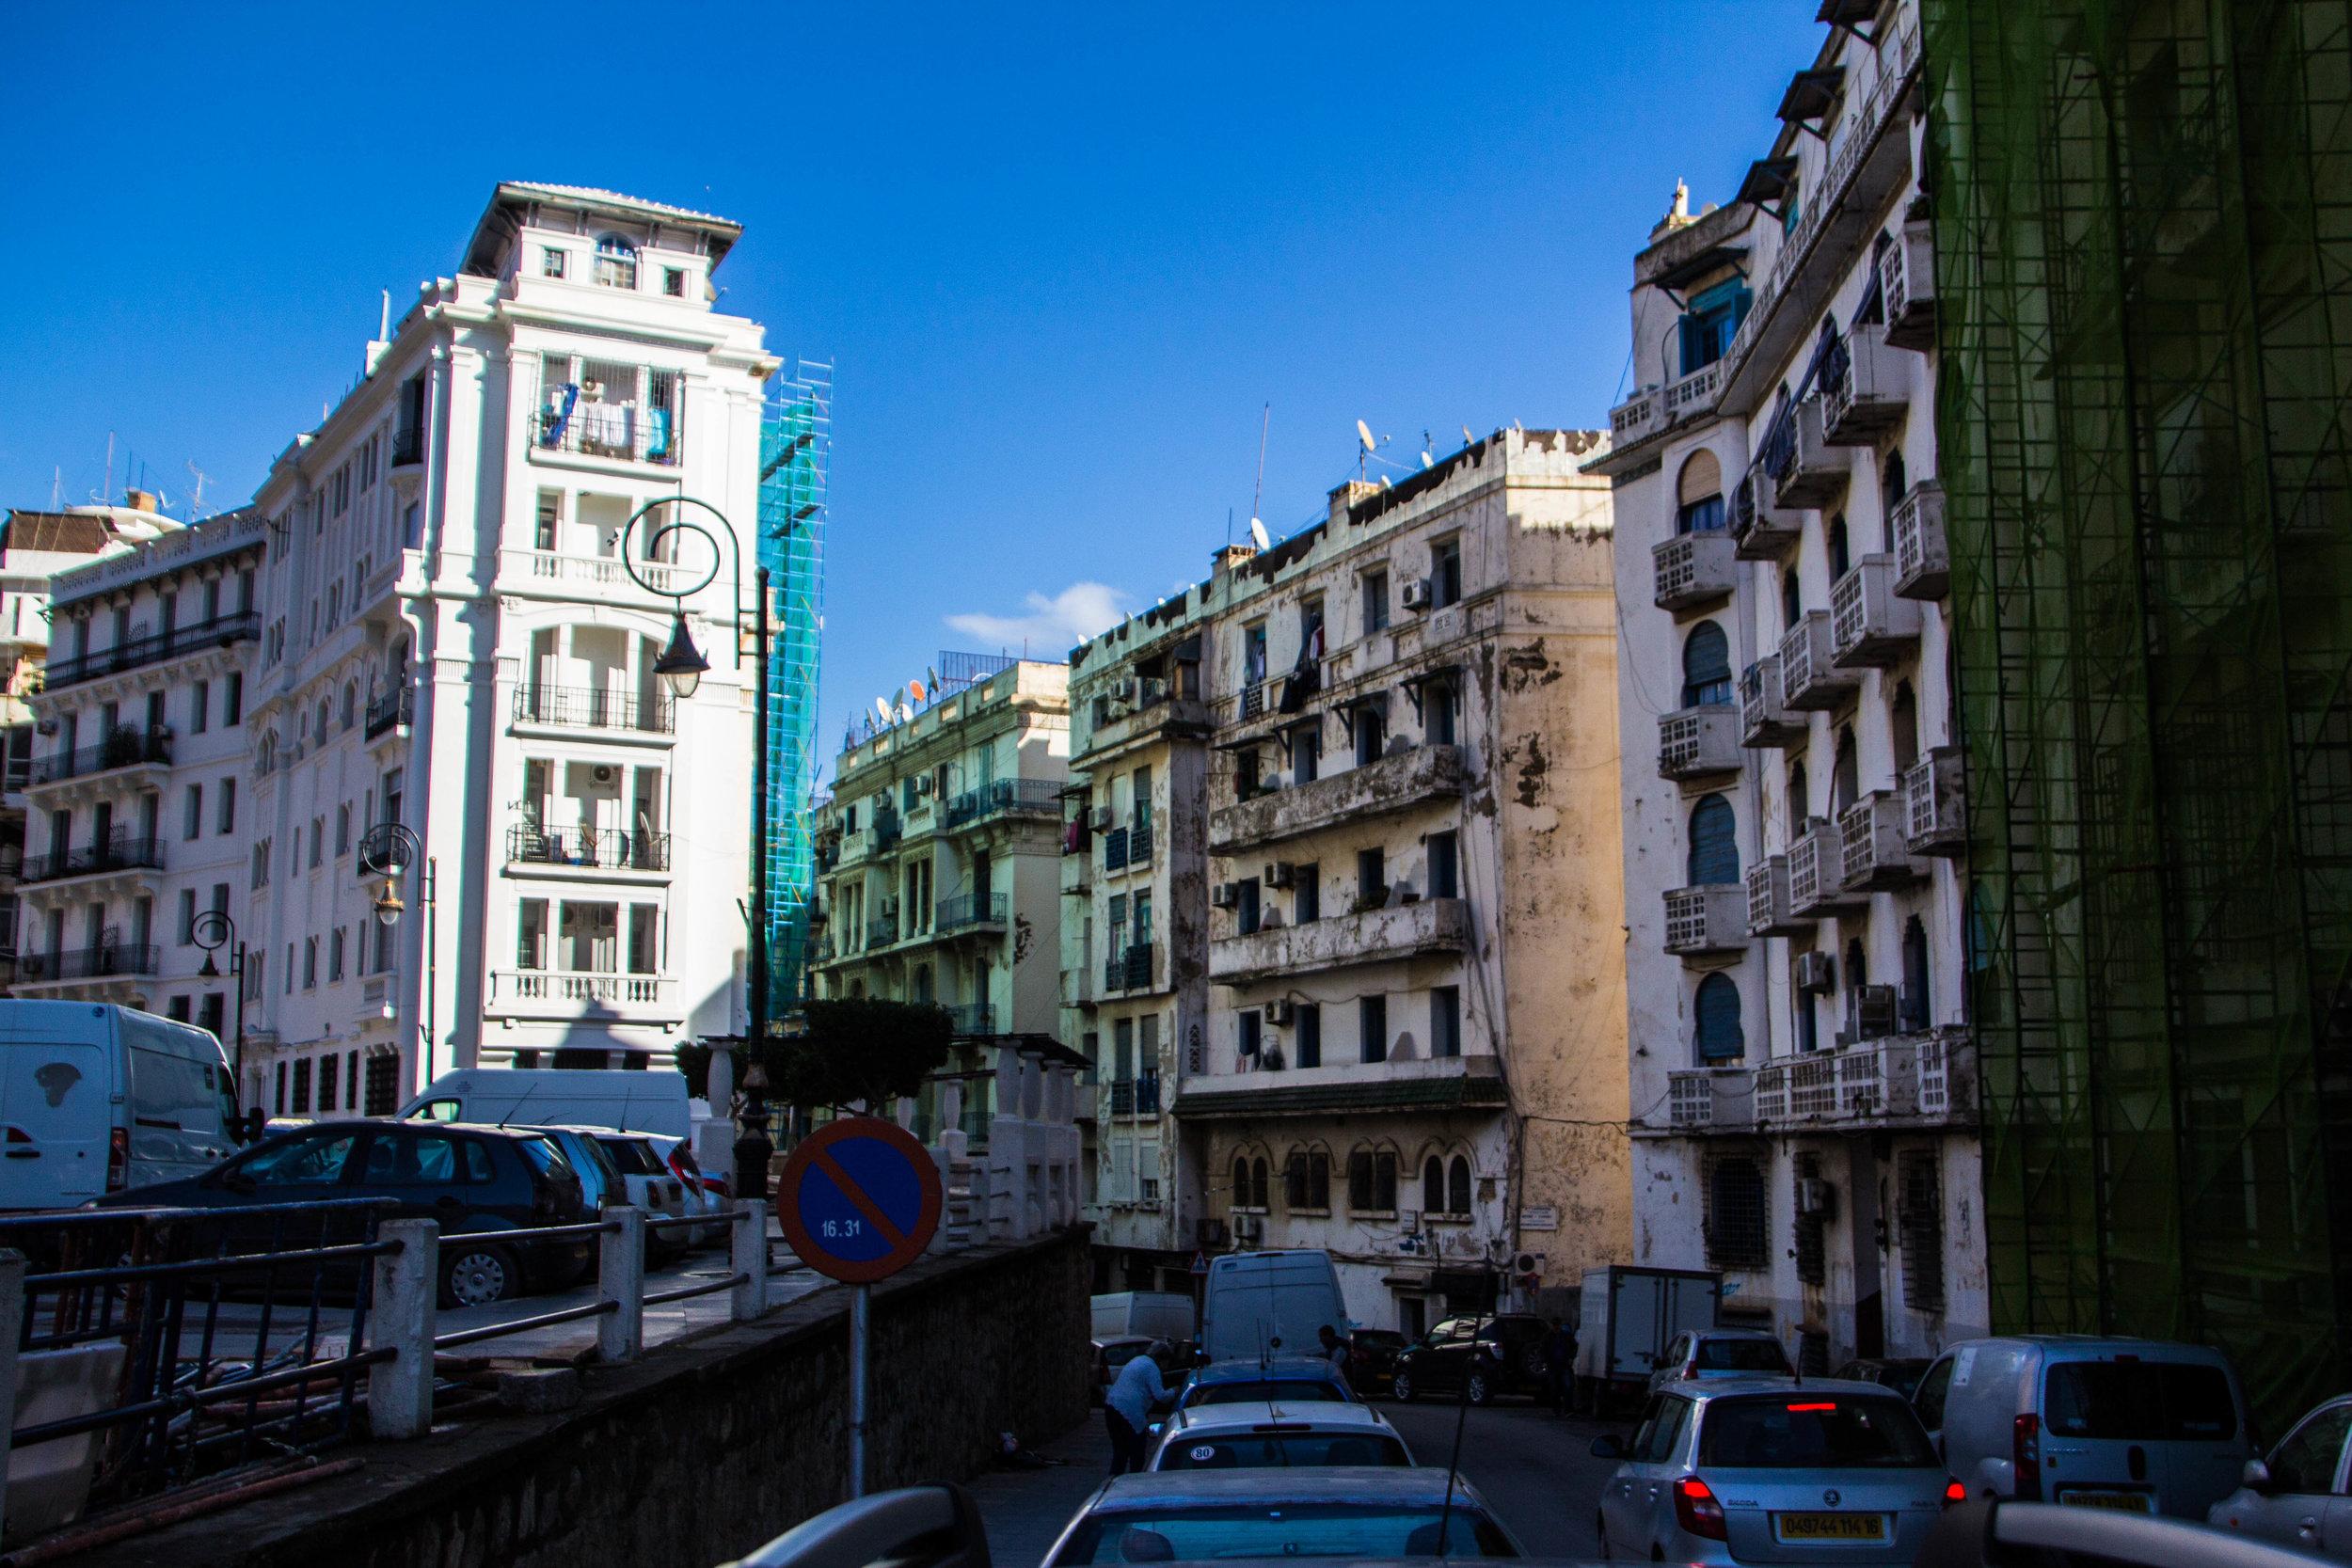 streets-algiers-algeria-8.jpg